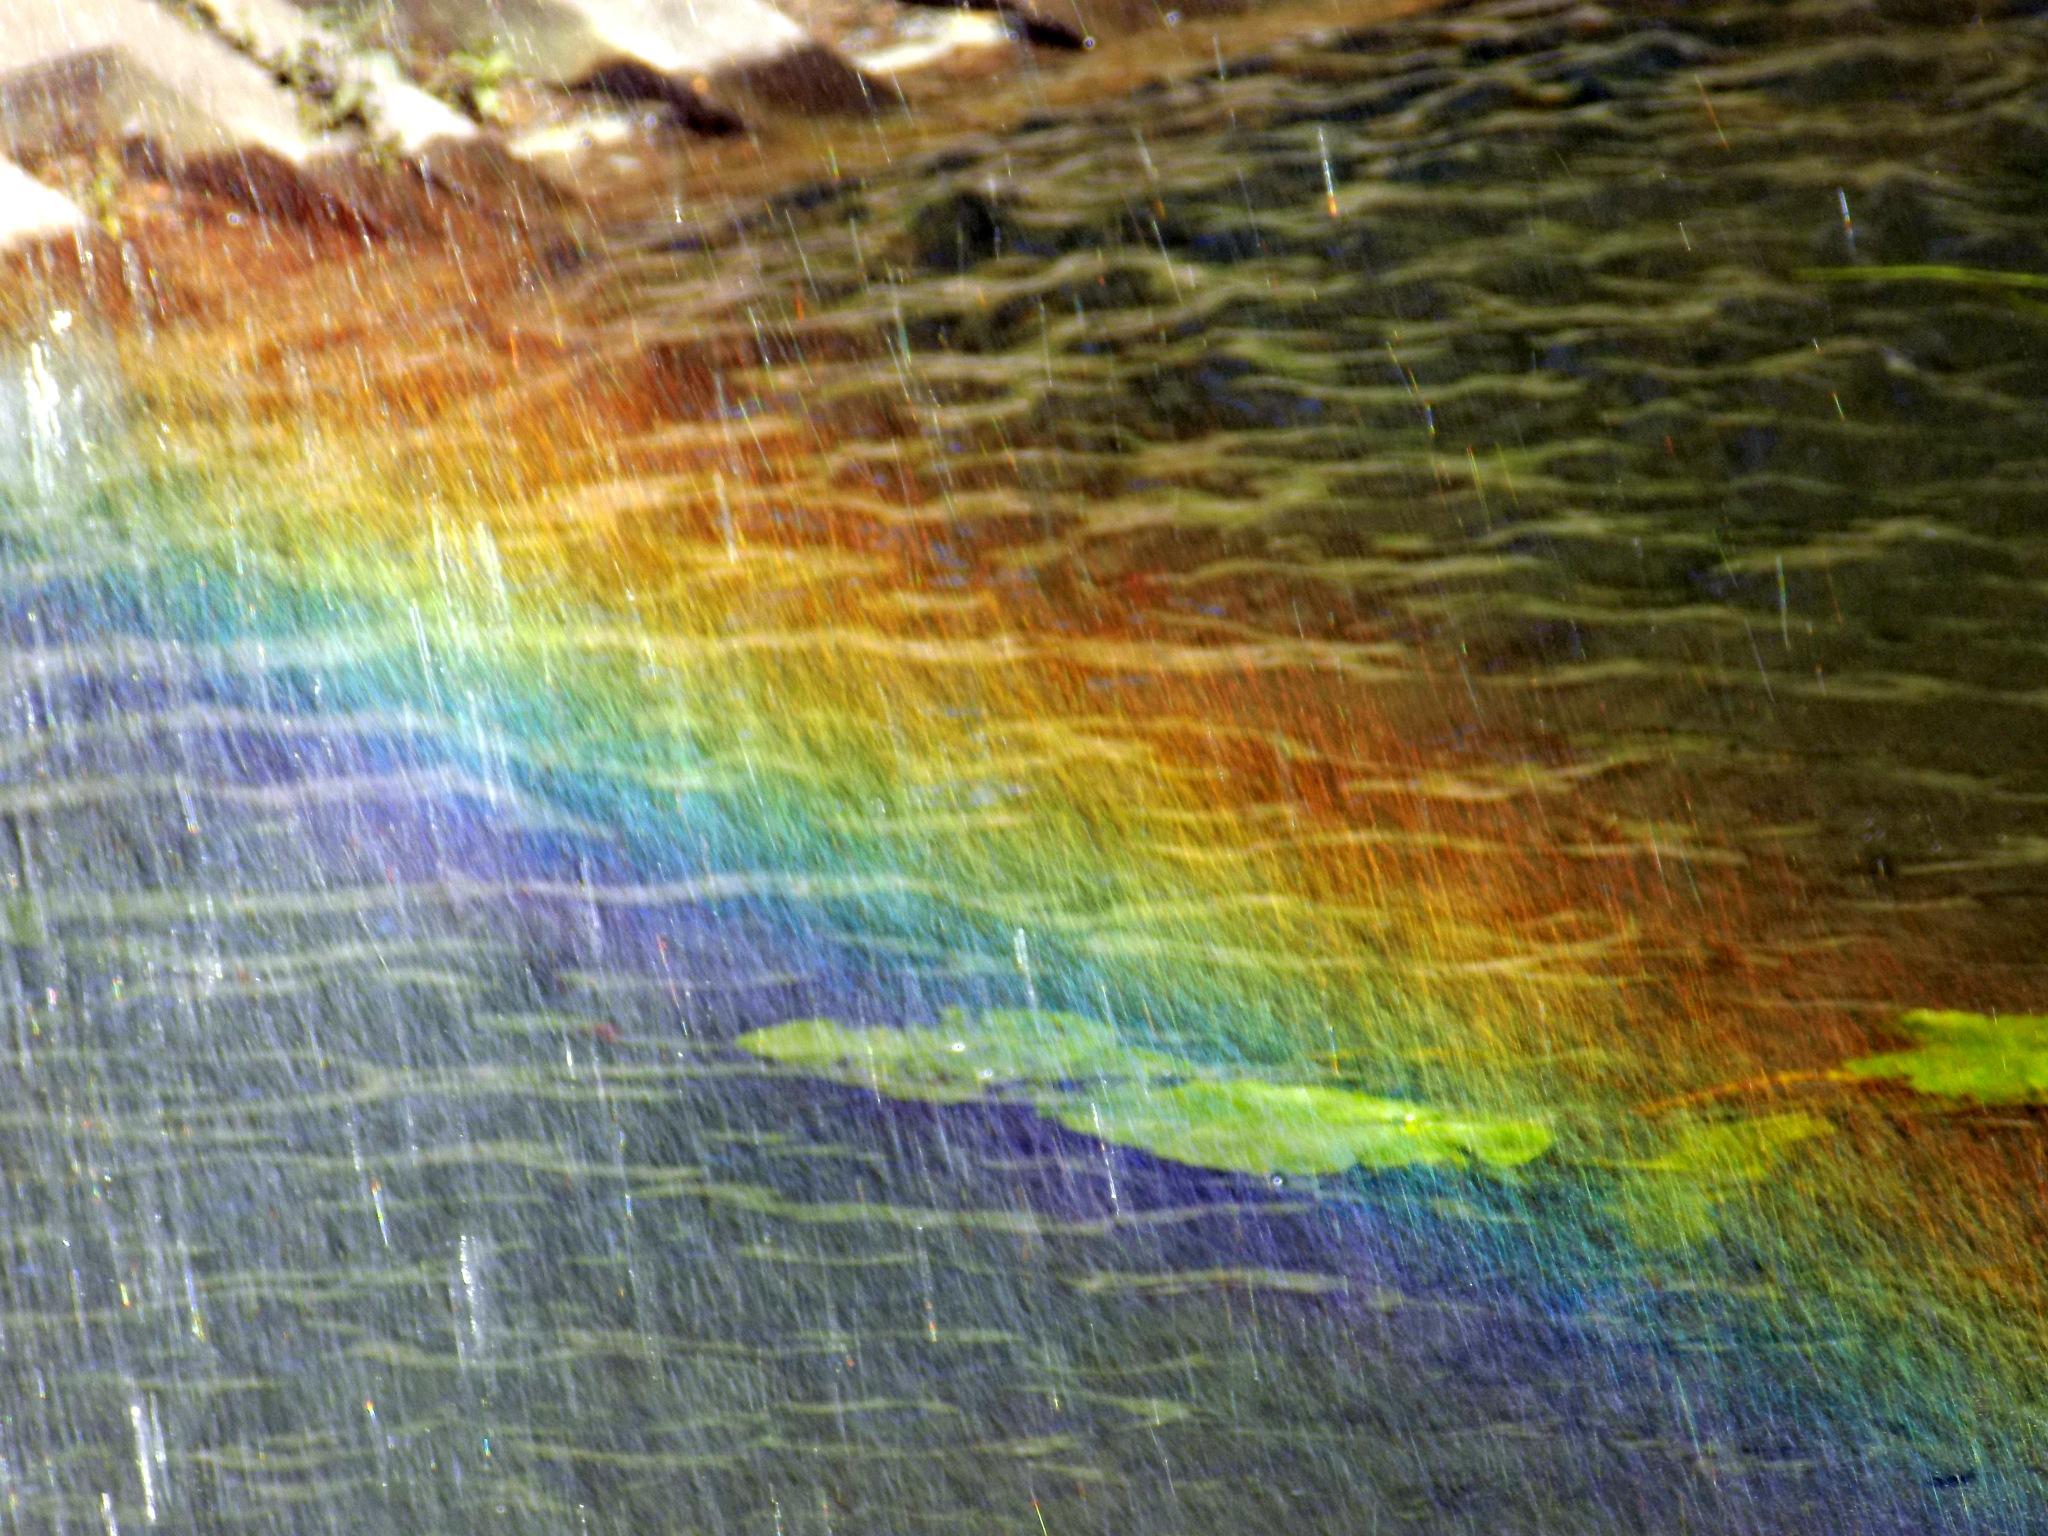 Rainbow colors by uzkuraitiene62